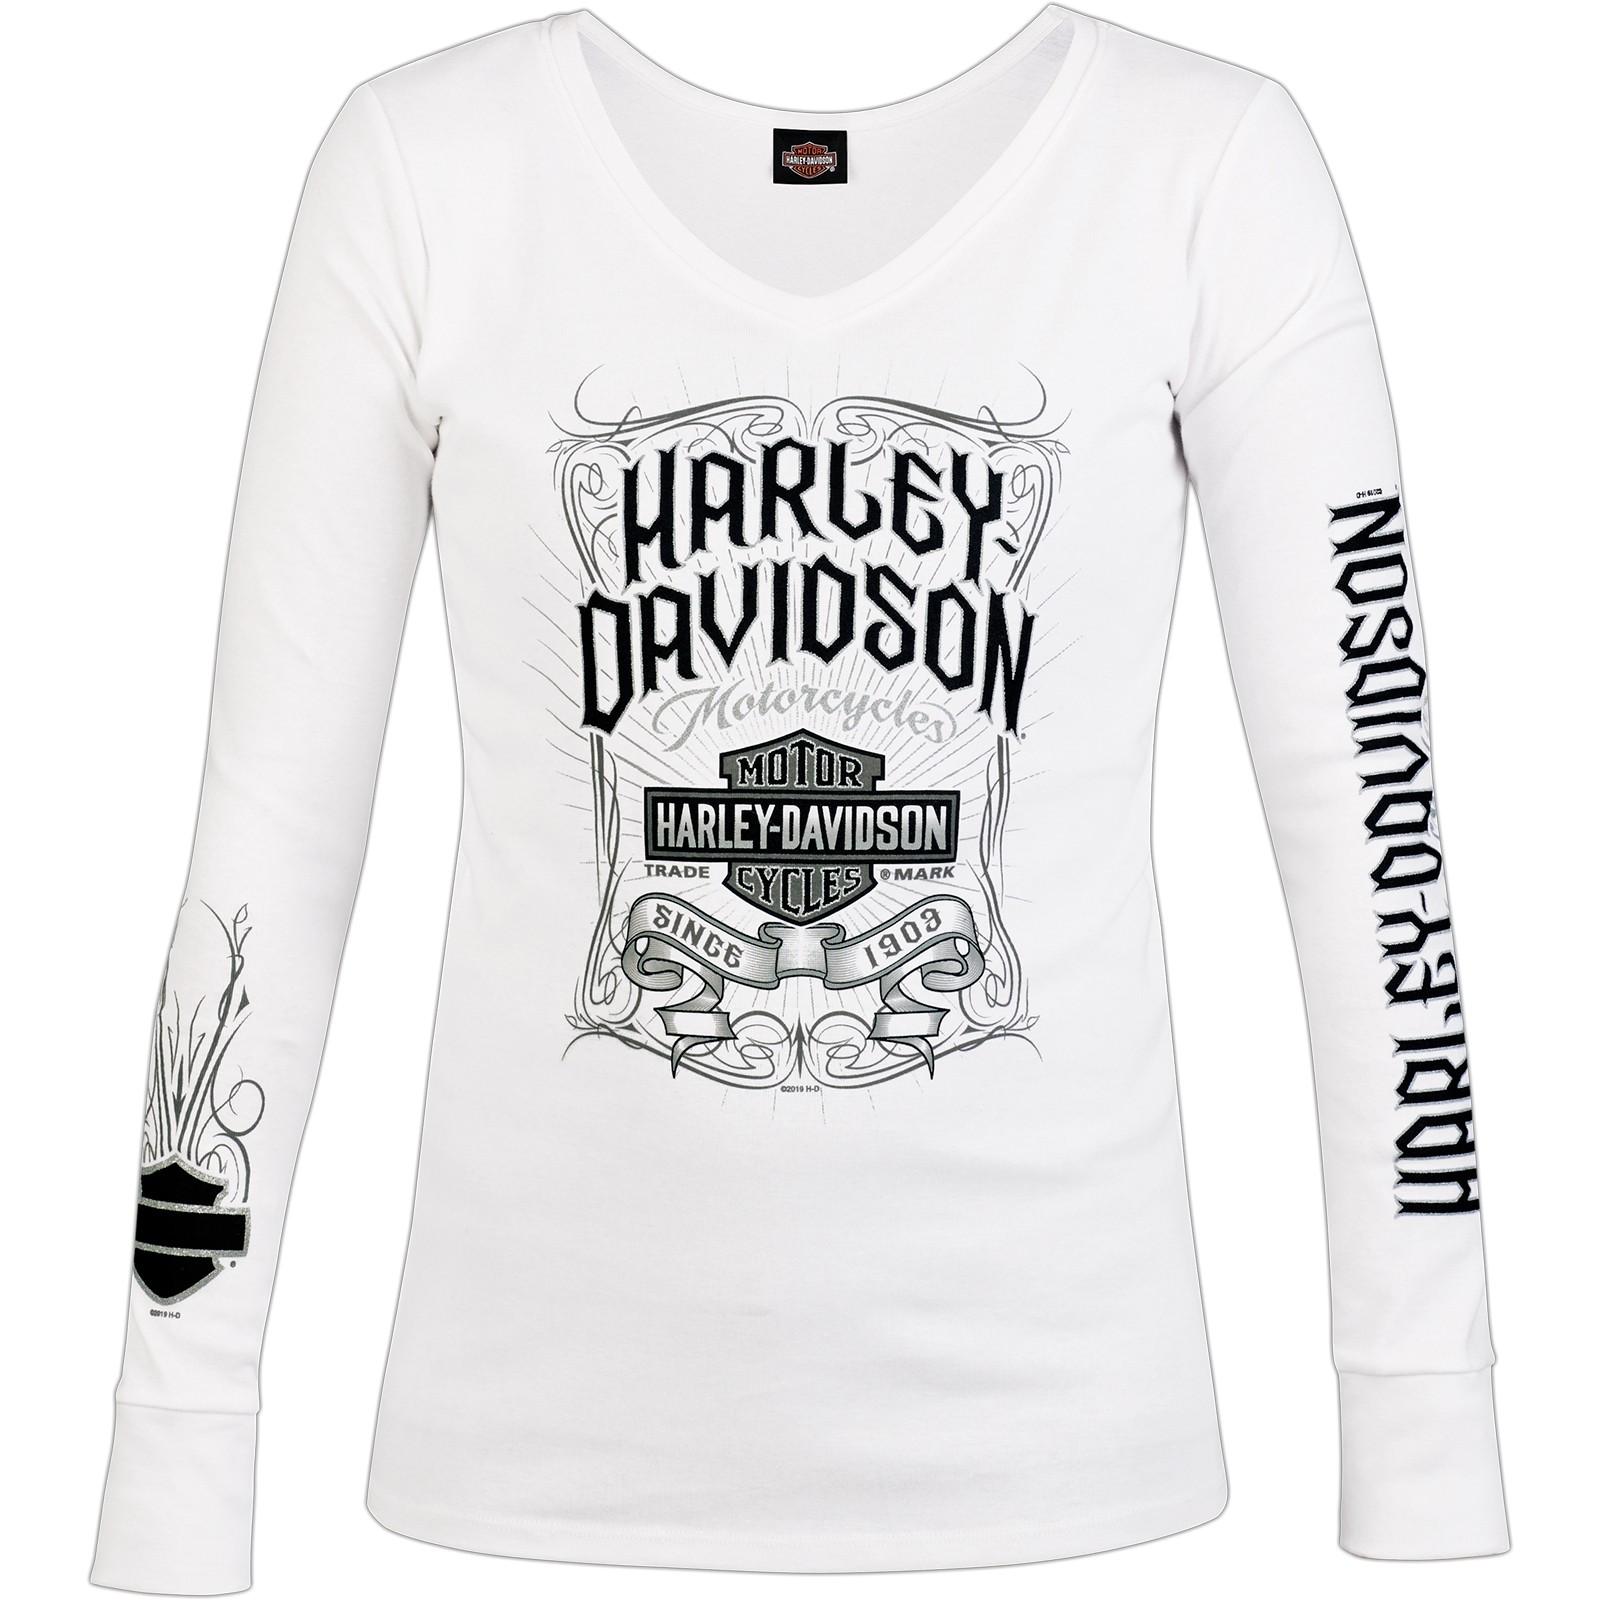 Harley-Davidson Military - Women's White Long-Sleeve V-Neck Graphic T-Shirt - NAS Sigonella   Pennant